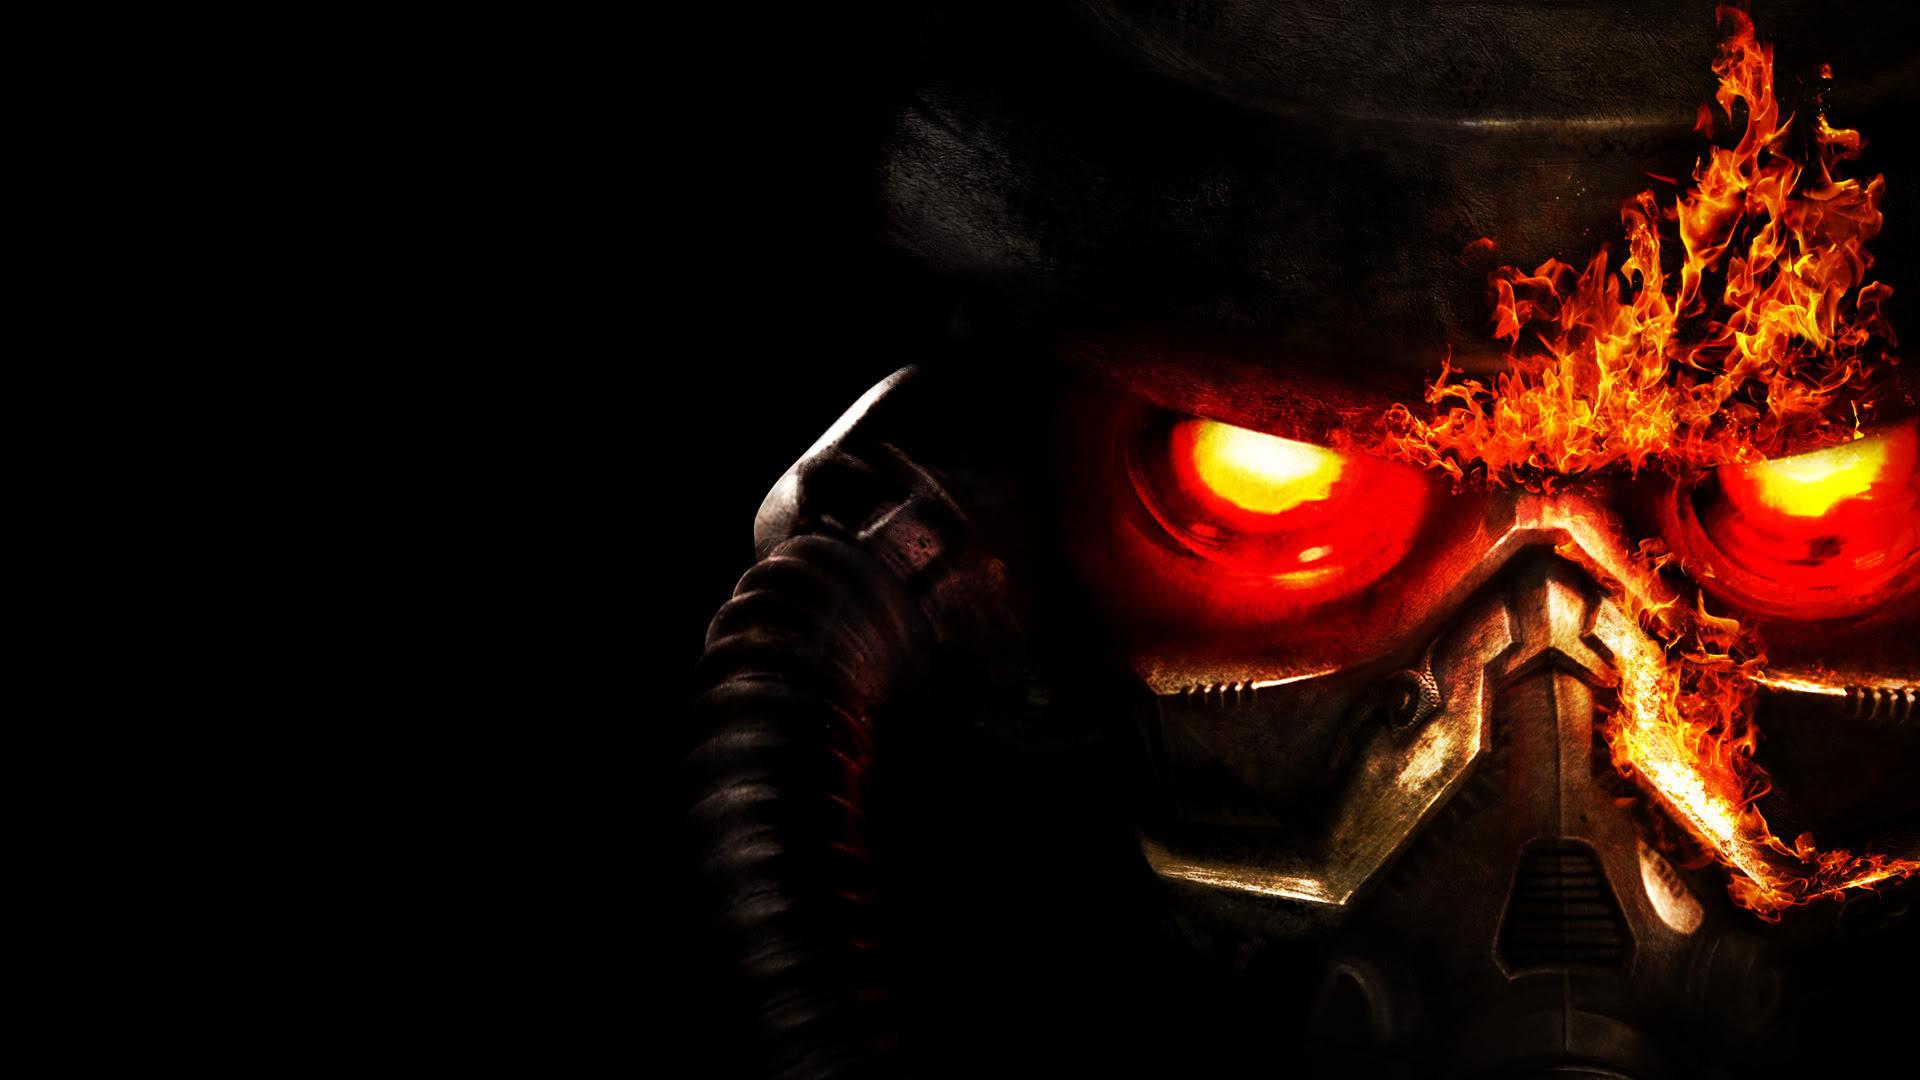 fire wallpaper predator